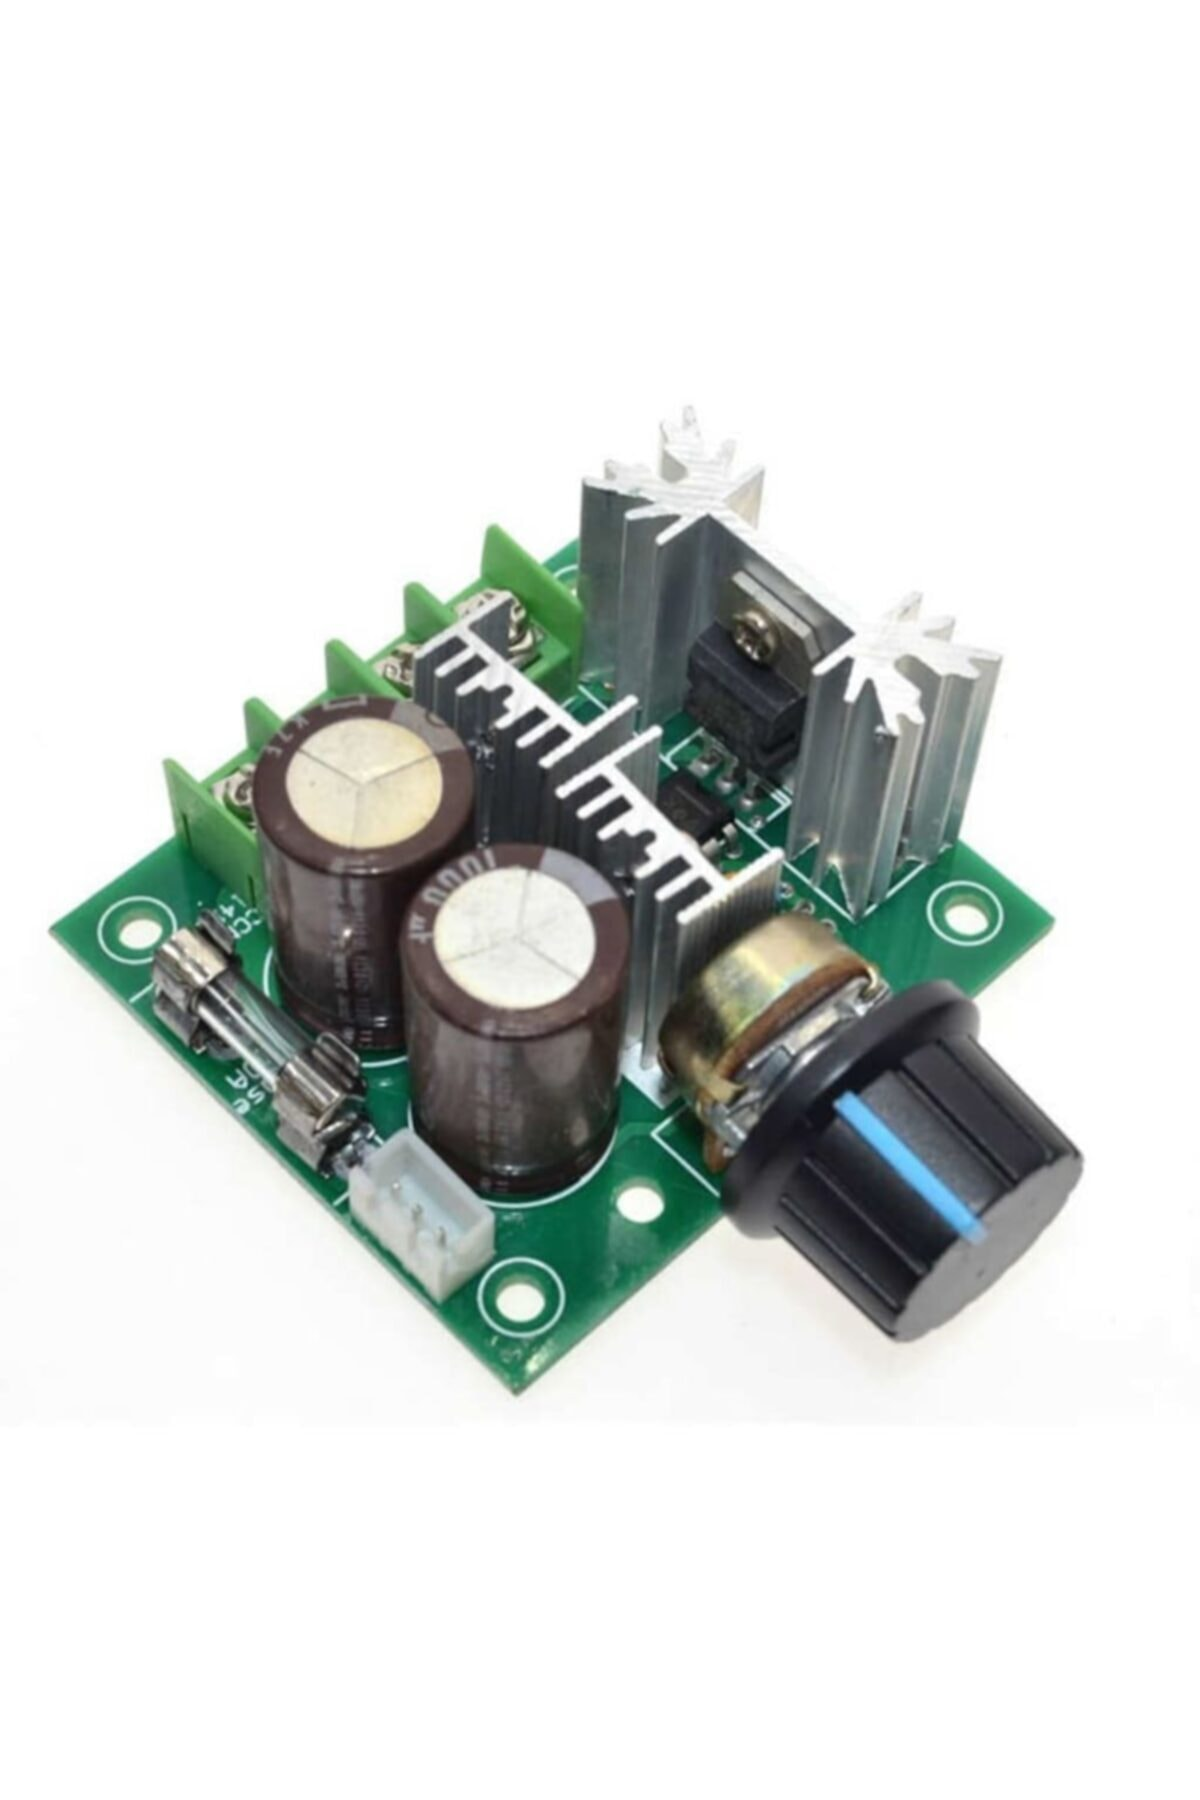 EMRE ELEKTRONİK Dc Motor Hız Kontrol Devresi 12v-40v 10a Dc Motor Sürücü Dimmer 1